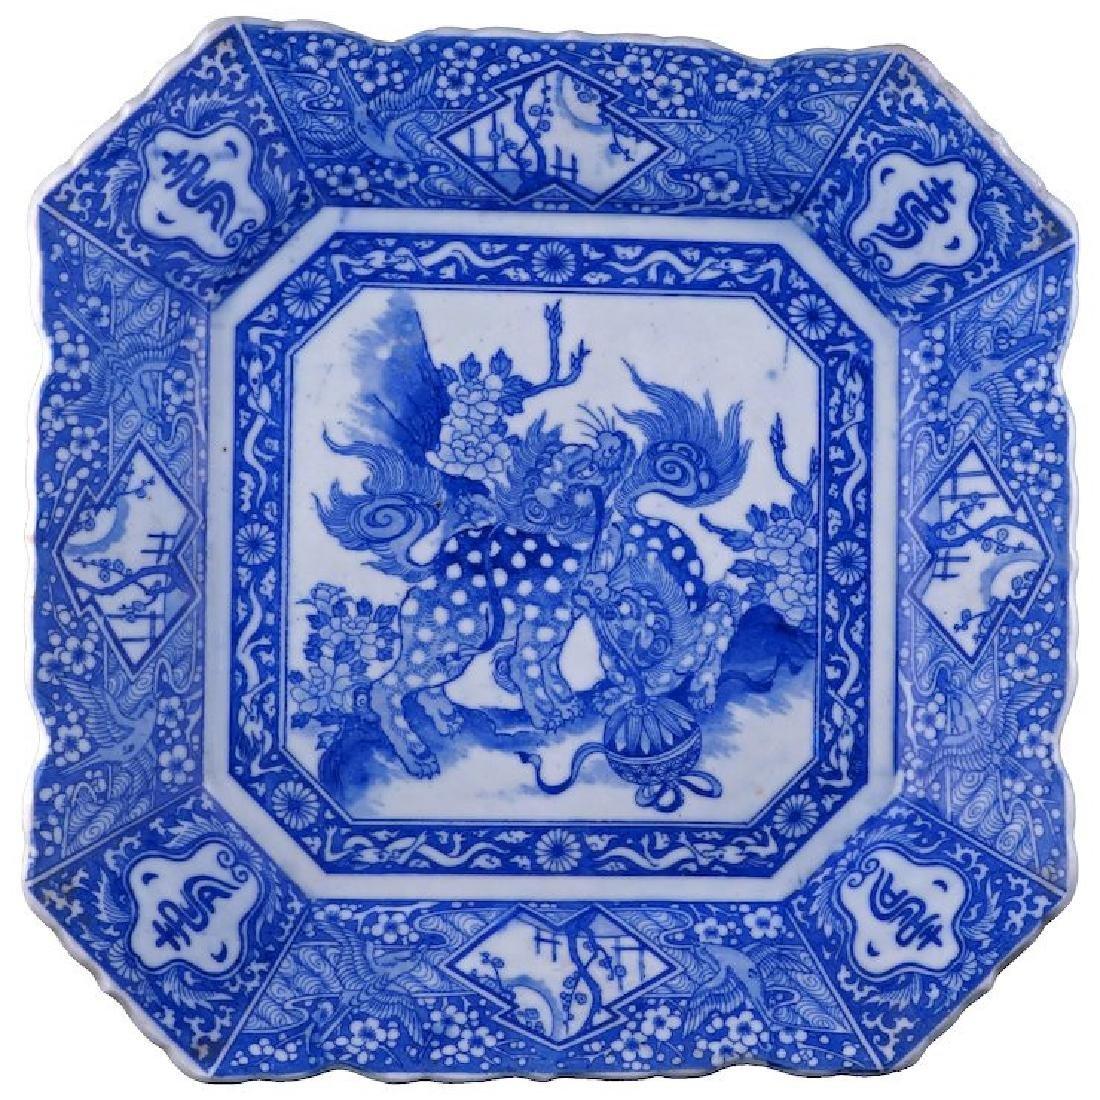 Japanese square porcelain Igezara ware blue and white